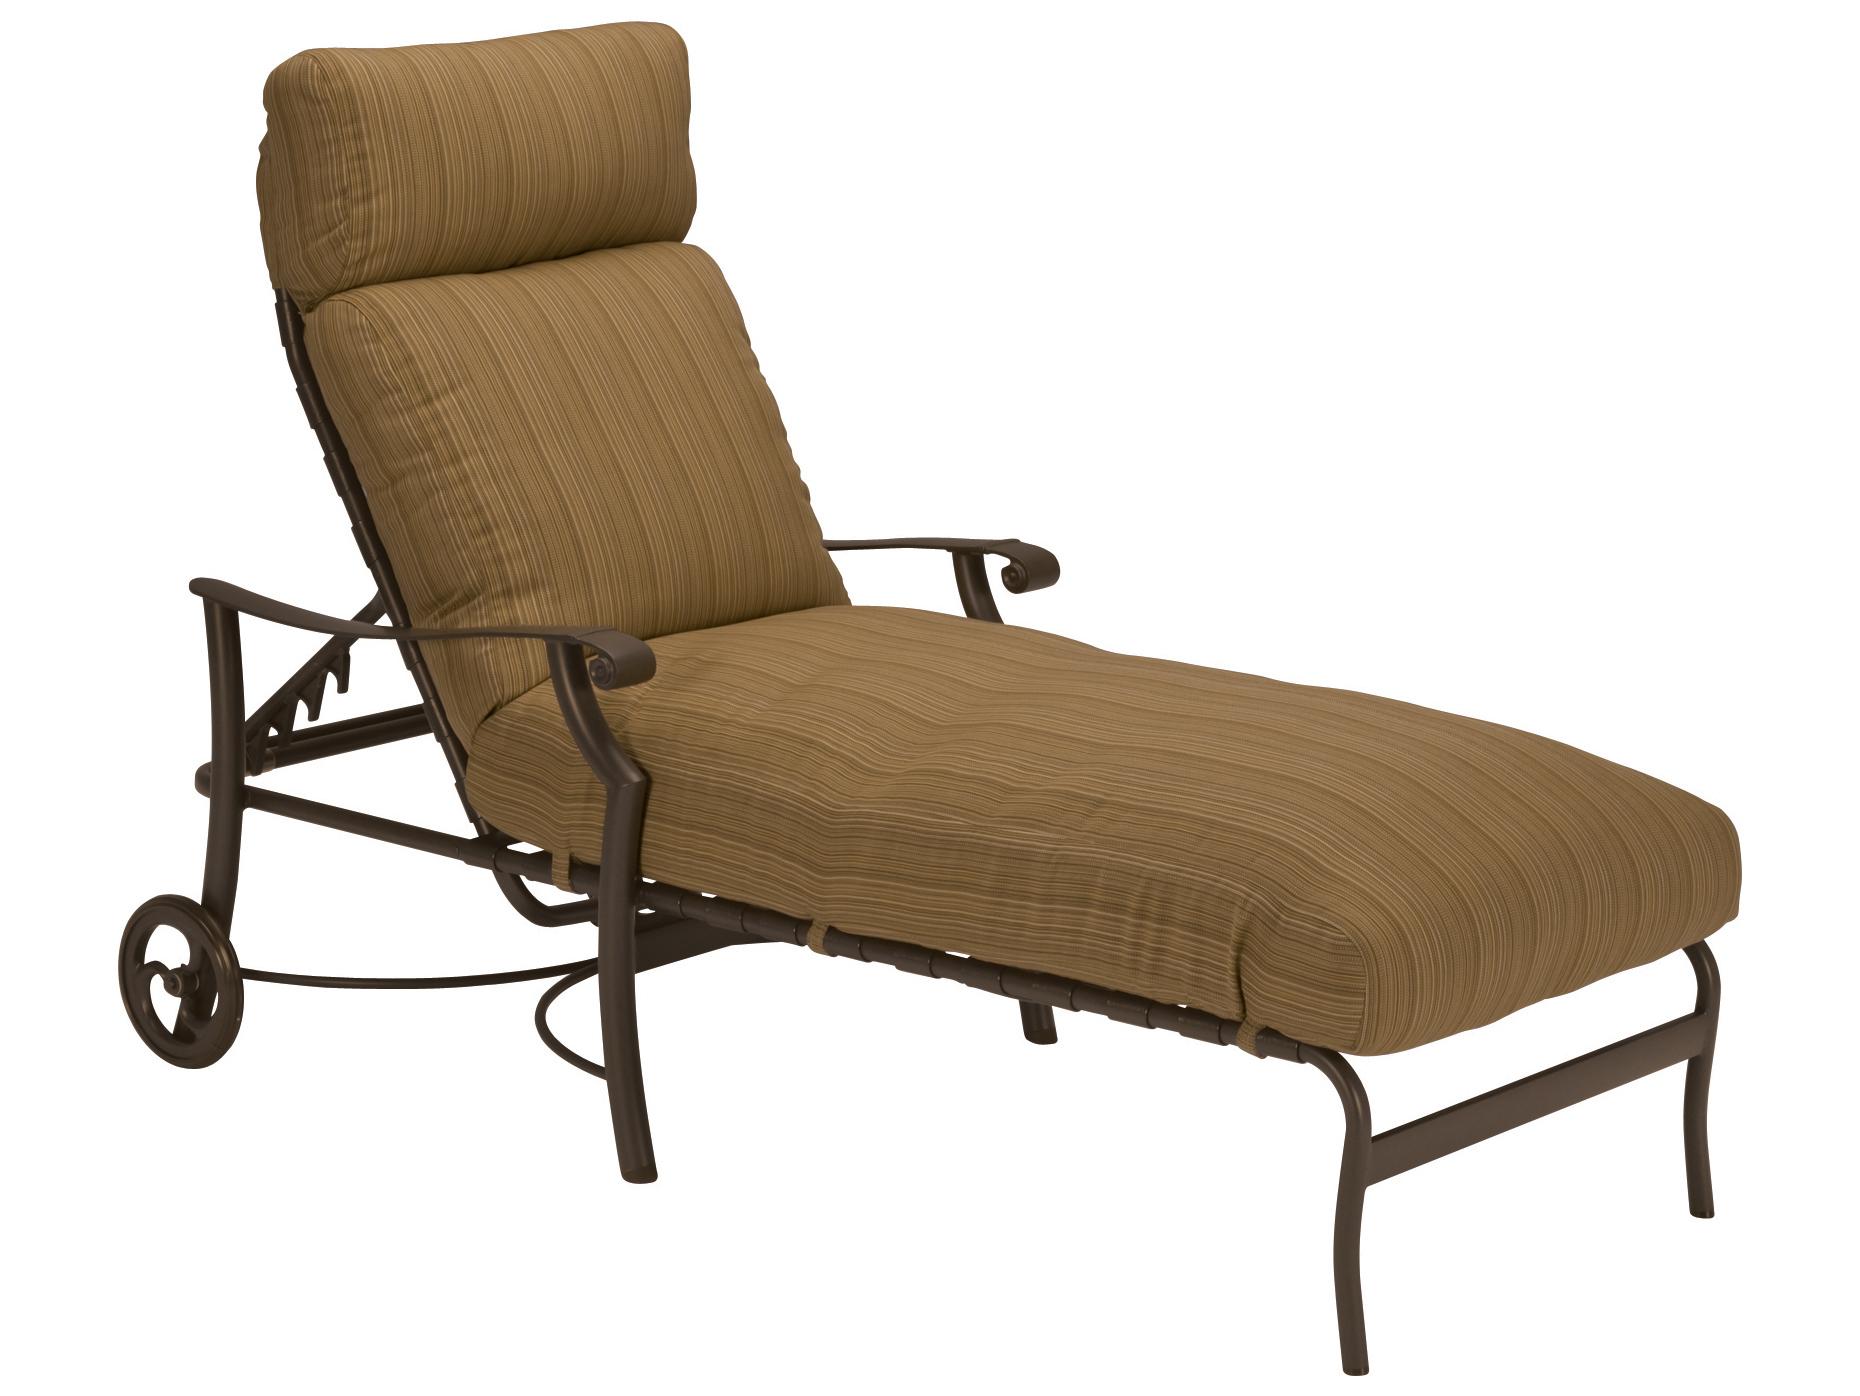 Tropitone Montreux Cushion Aluminum Chaise Lounge with ...